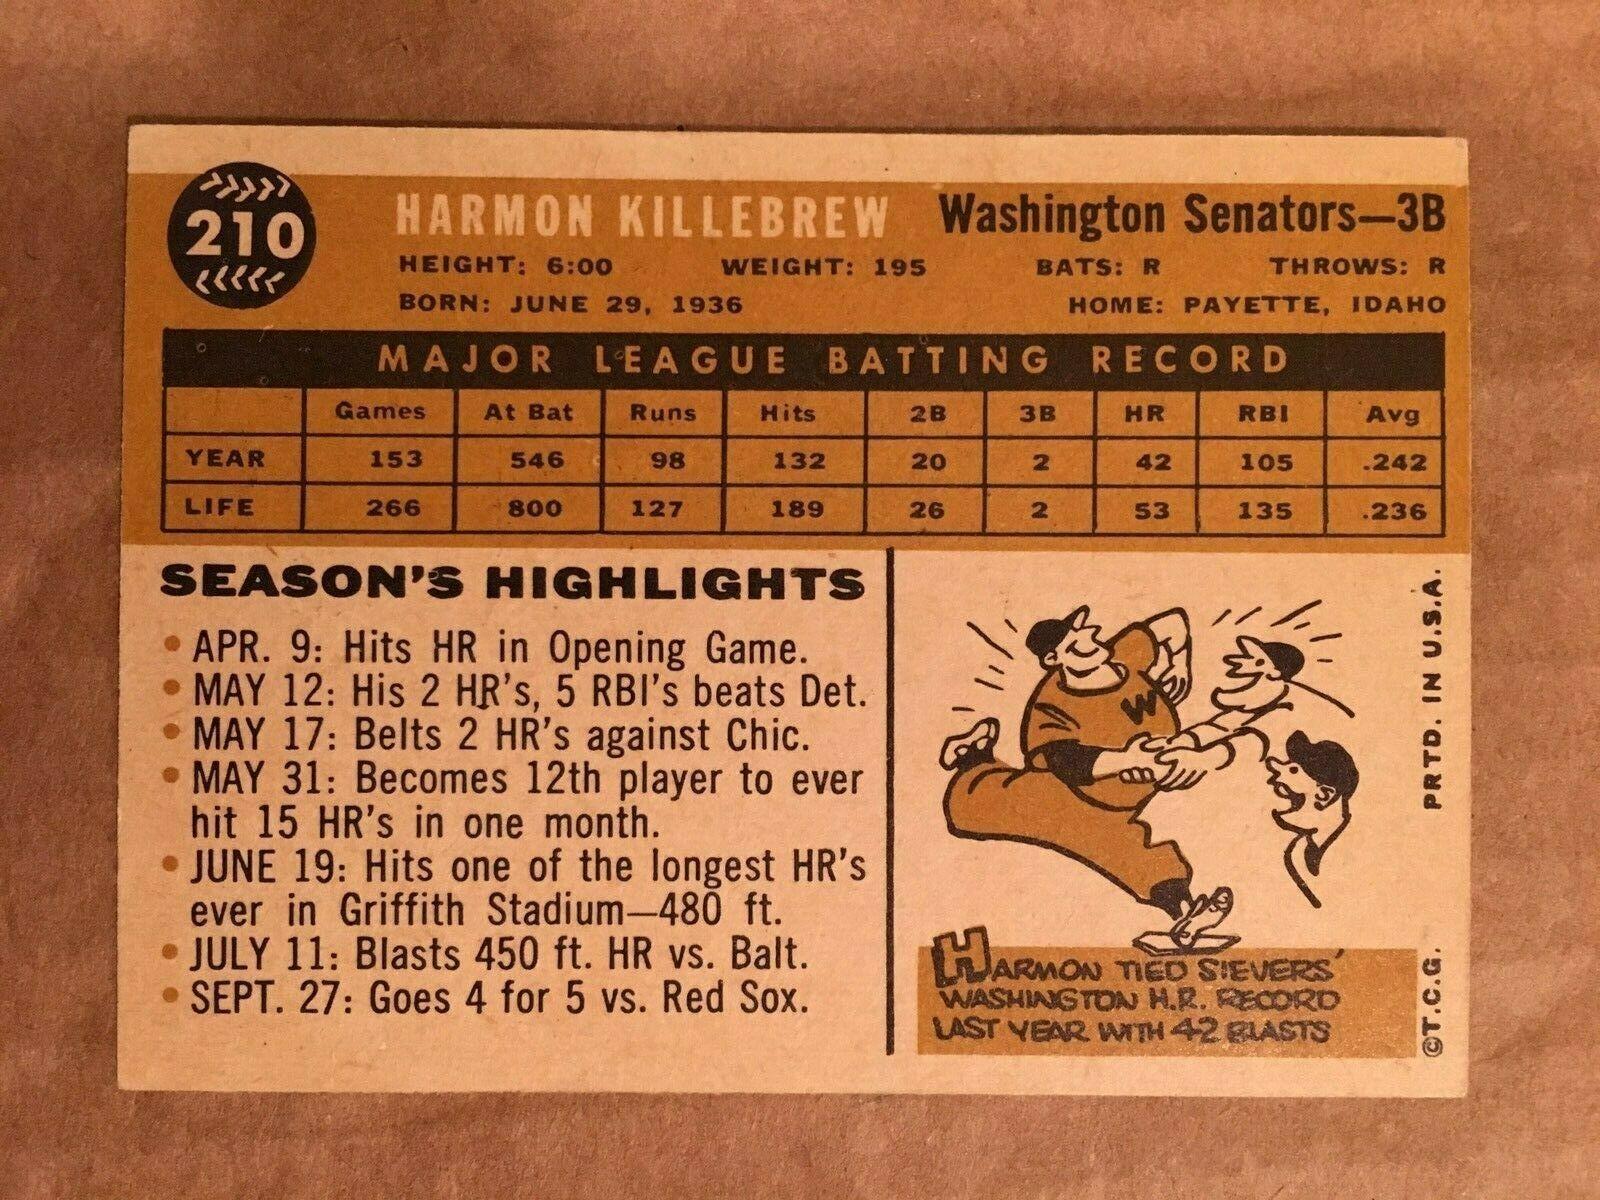 1960 Topps #210 Harmon Killebrew Baseball Card NM Condition Senators RF1